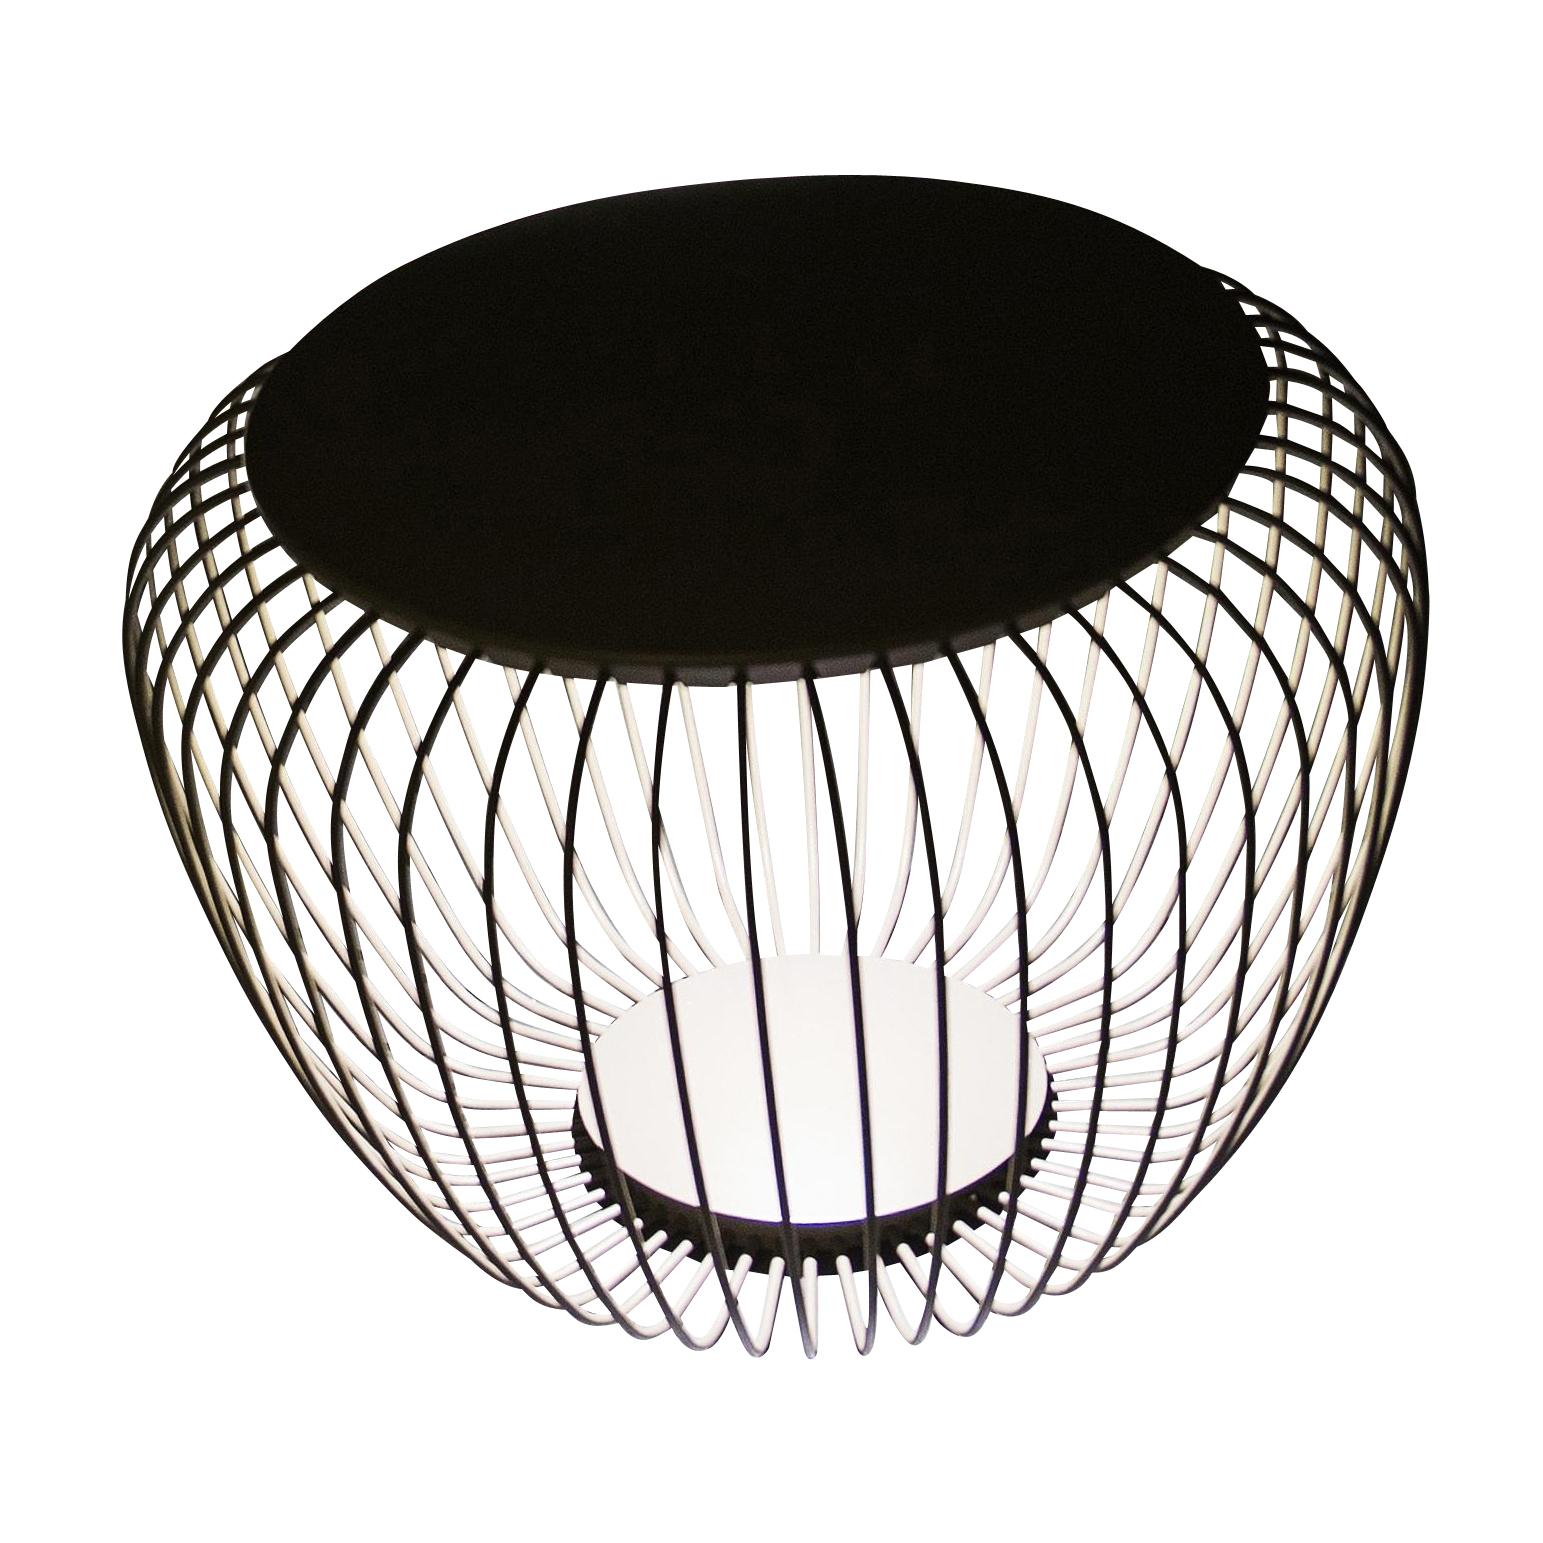 Vibia - Meridiano 4710 LED Außenbodenleuchte - khaki/matt/H 46cm / Ø 64cm/2700K/1041lm/CRI>80/ nicht dimmbar   Lampen > Aussenlampen > Bodeneinbauleuchten   Khaki   Polyurethanschaum  edelstahl  glas   Vibia